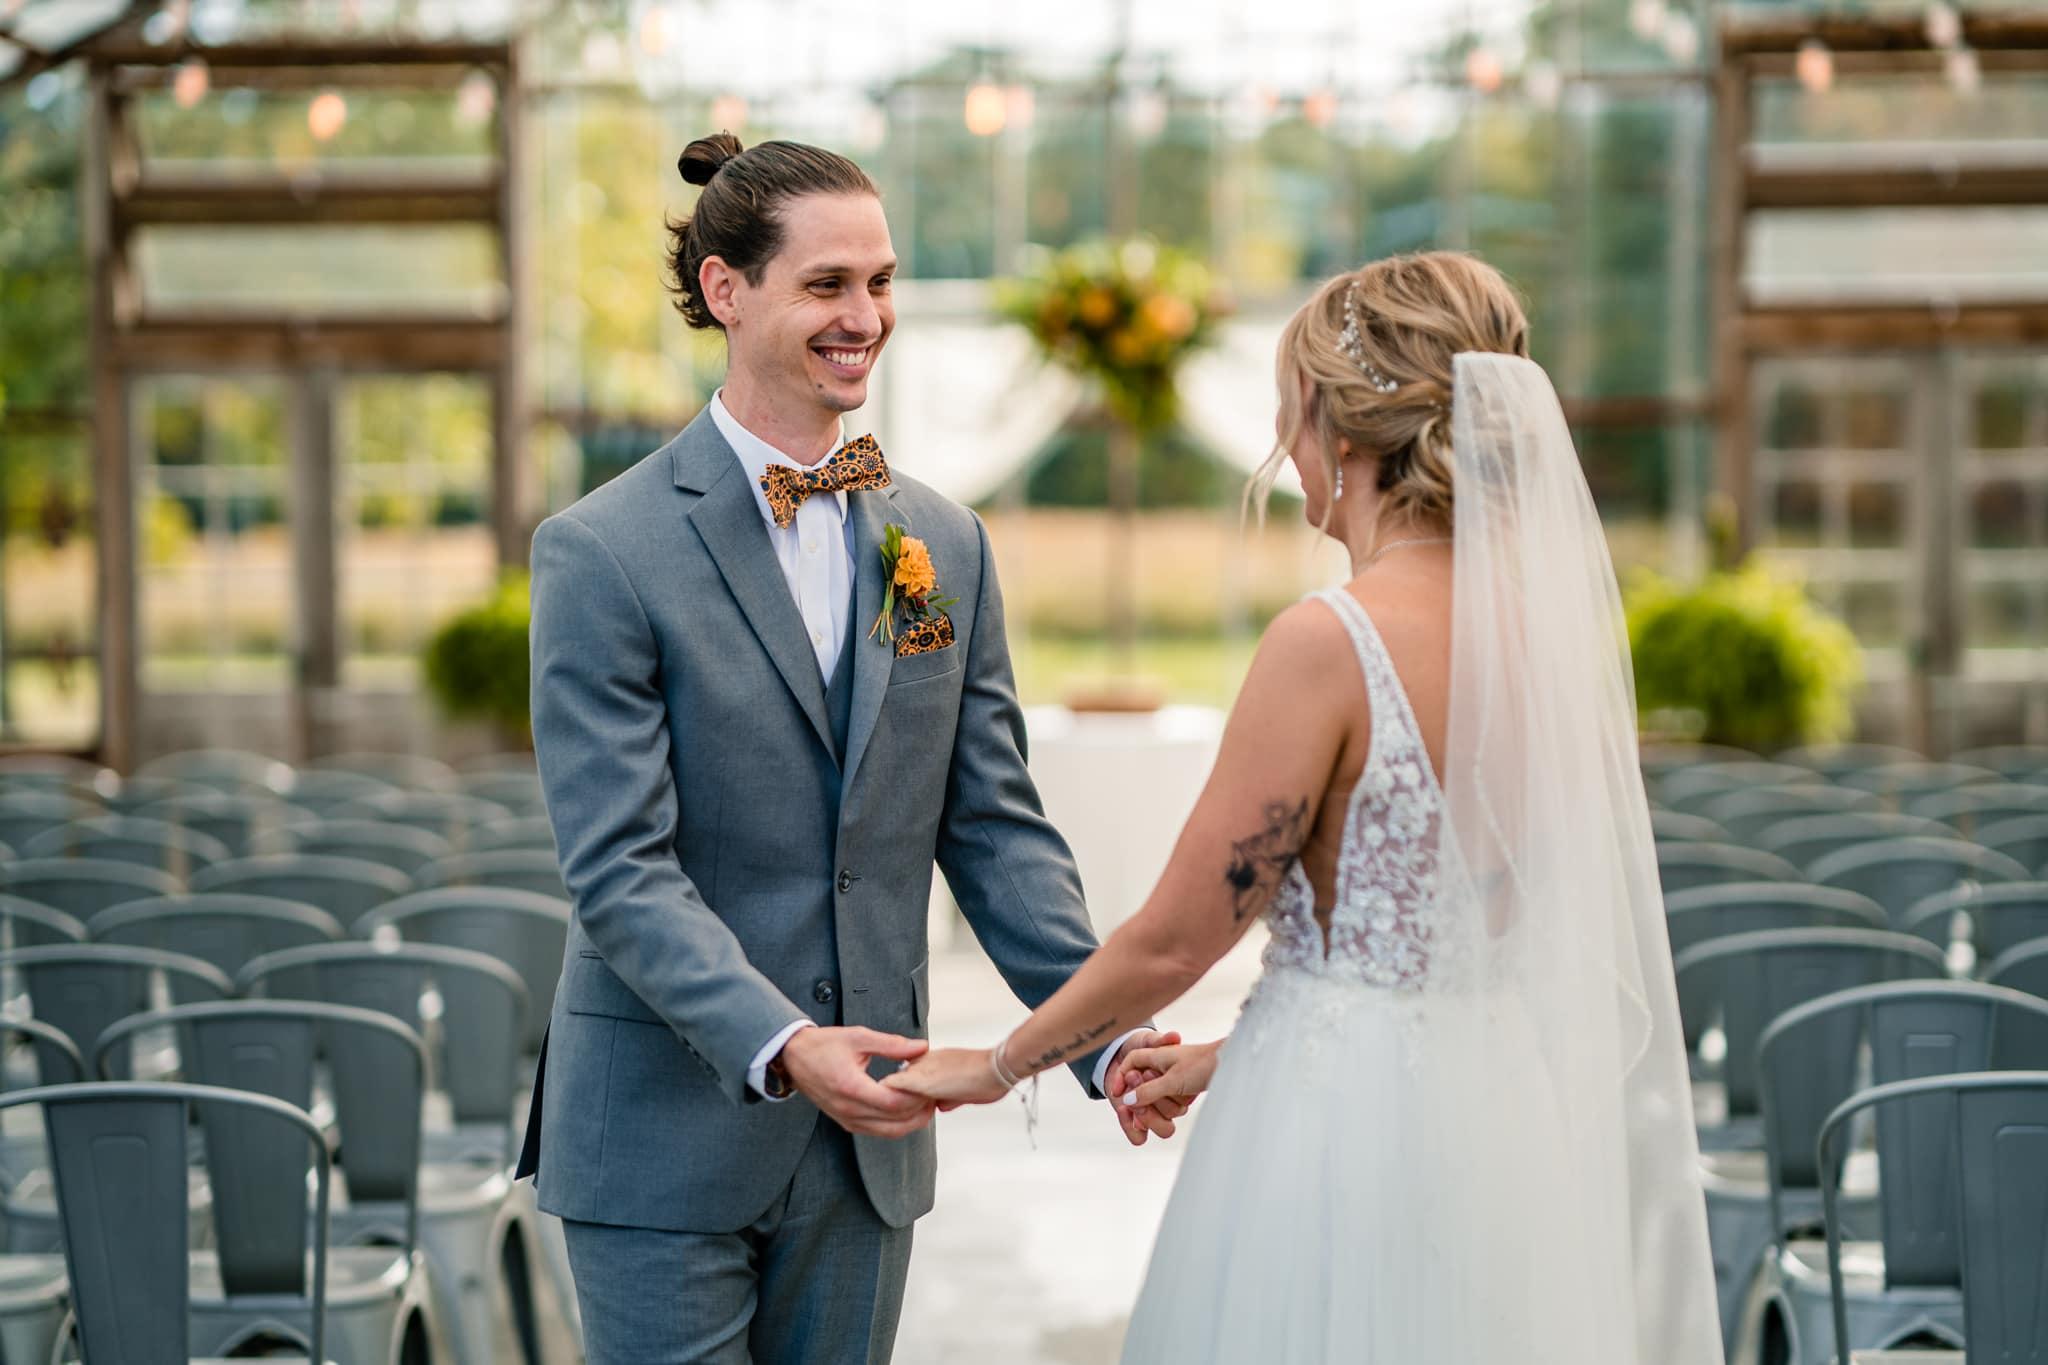 First look in modern greenhouse wedding